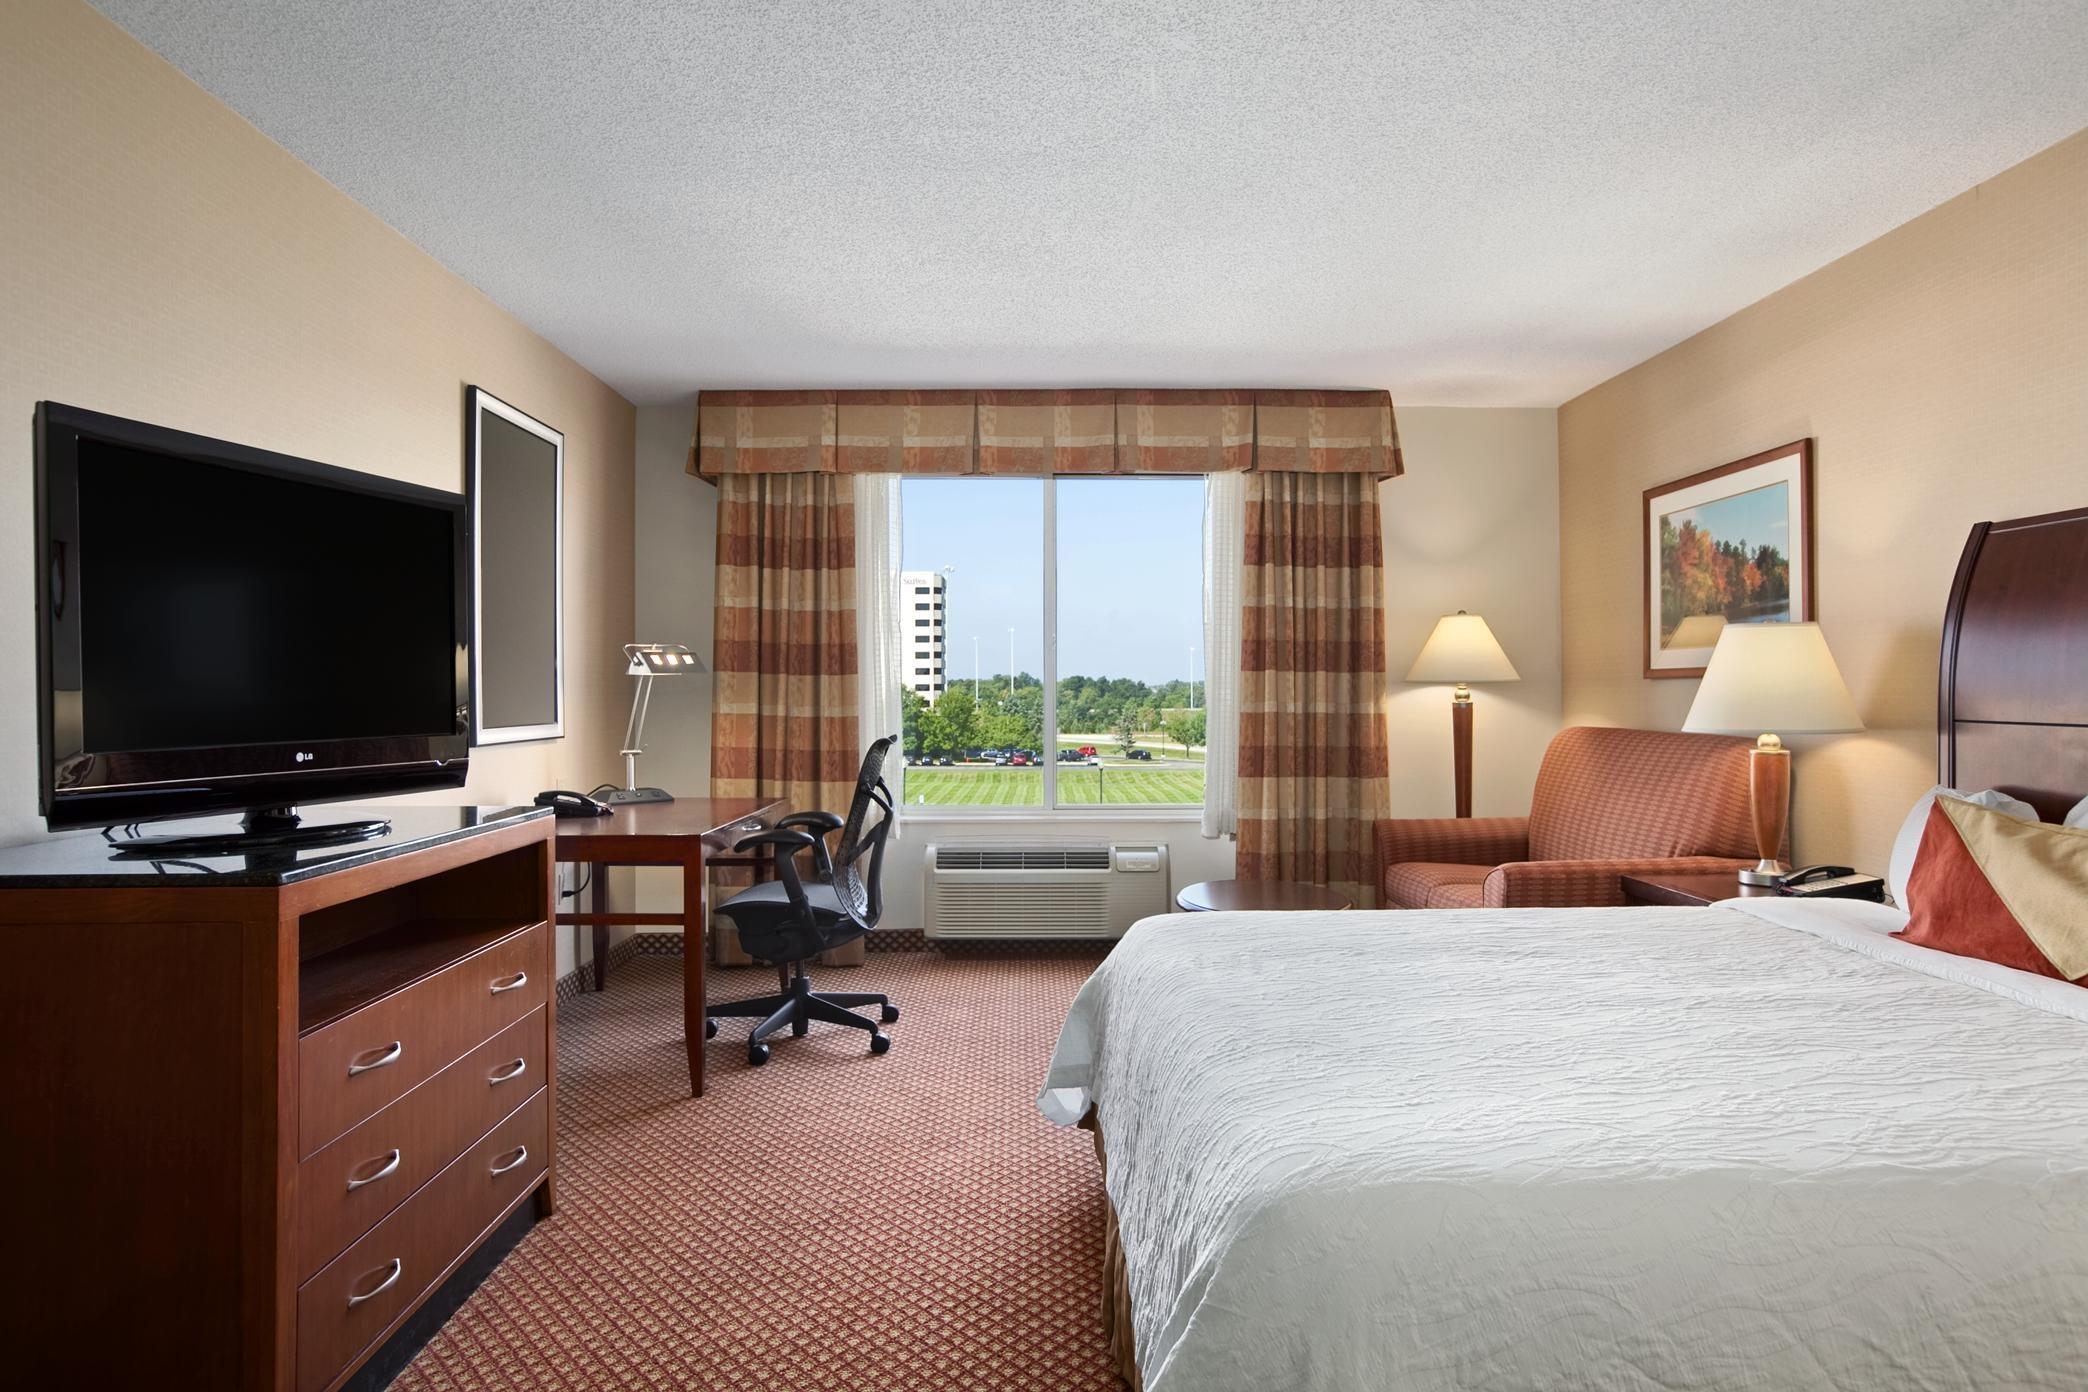 Hilton Garden Inn Chicago/Oakbrook Terrace image 11